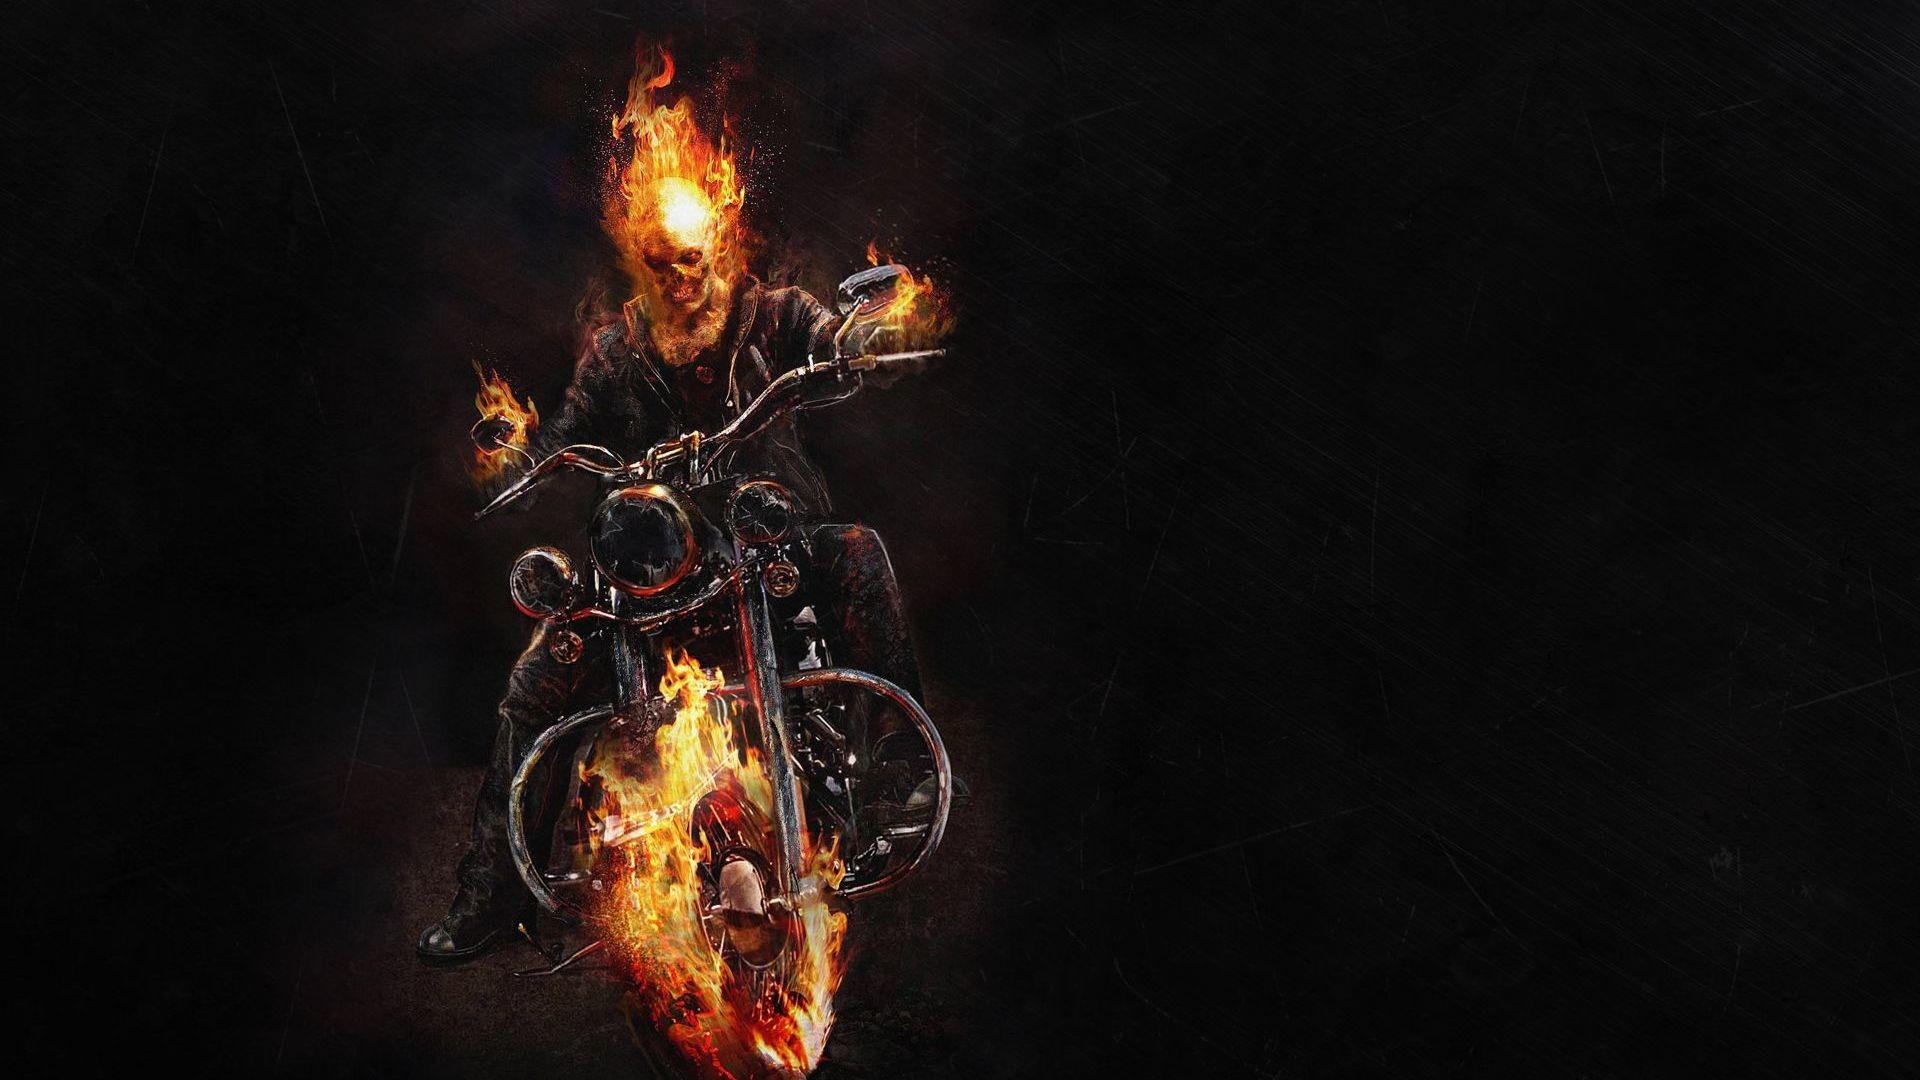 Ghost Rider HD Wallpaper | 999HDWallpaper | HD Wallpaper | Pinterest | Ghost  rider and Hd wallpaper